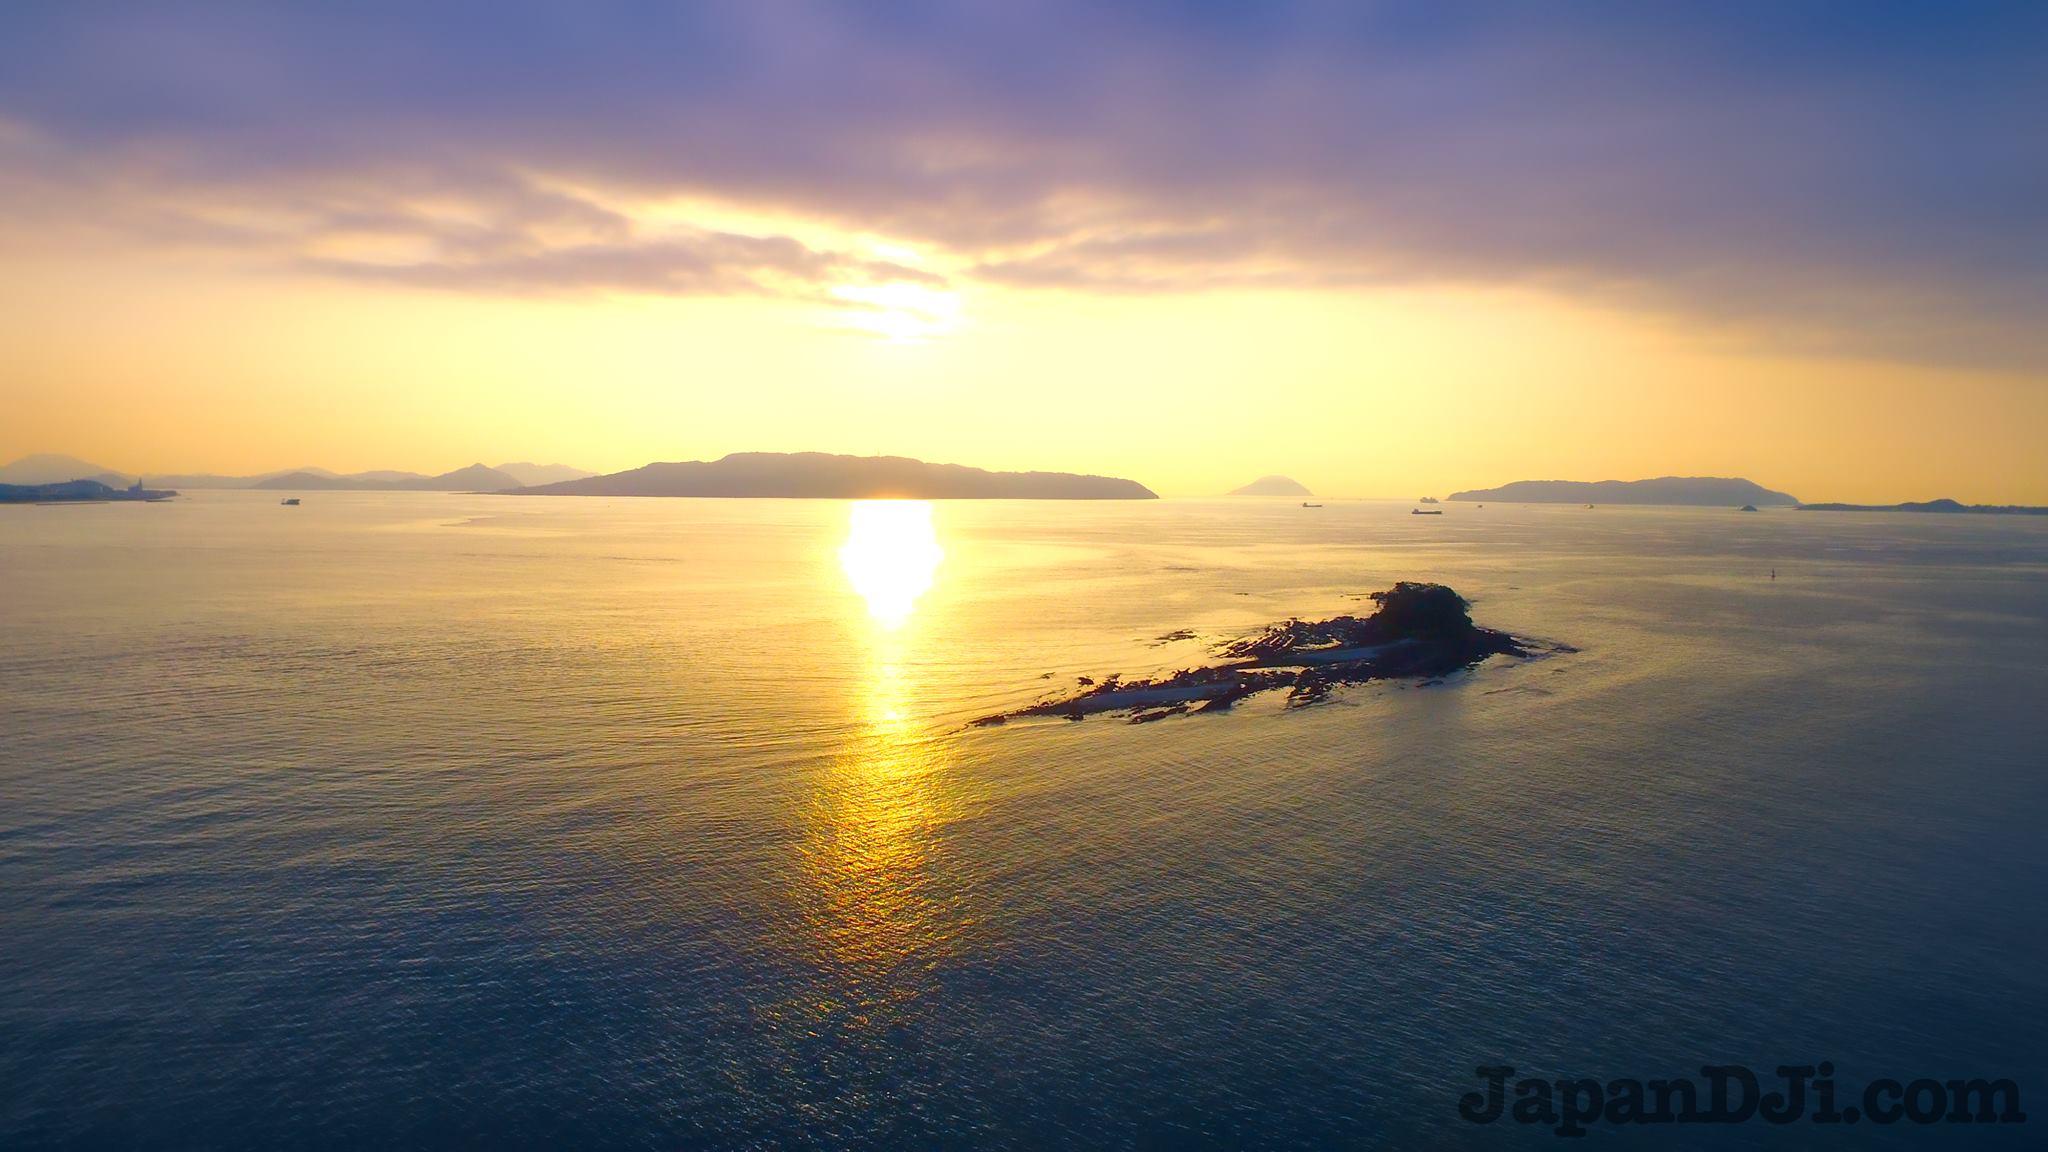 Uginoshima Island off Fukuoka